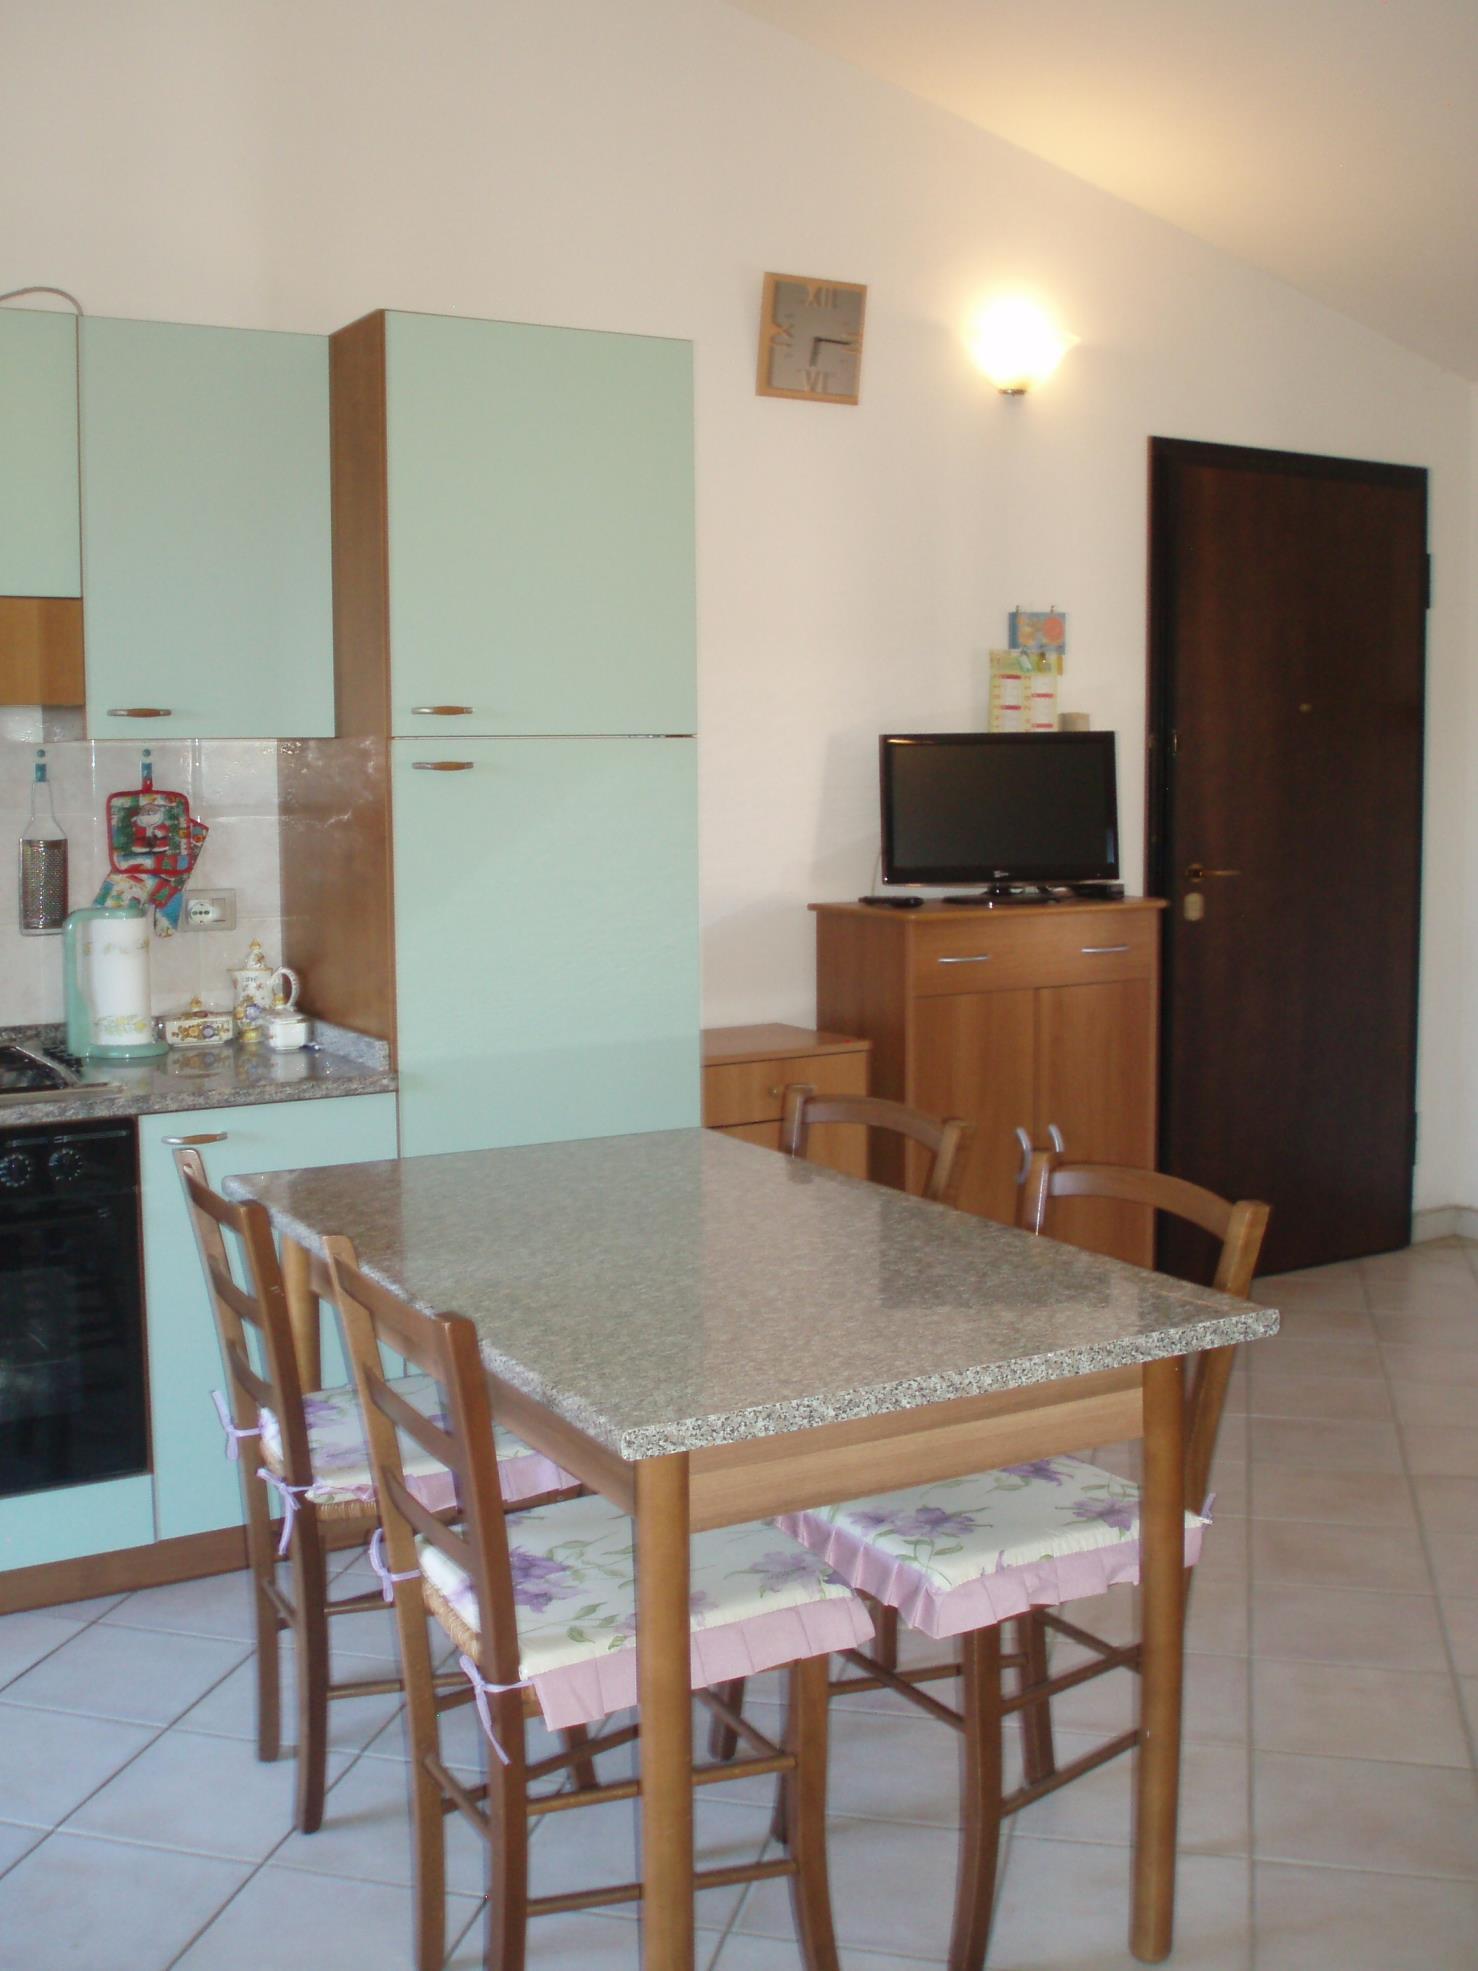 Appartamento Vacanze in Residence ad Arbatax-Tortolì